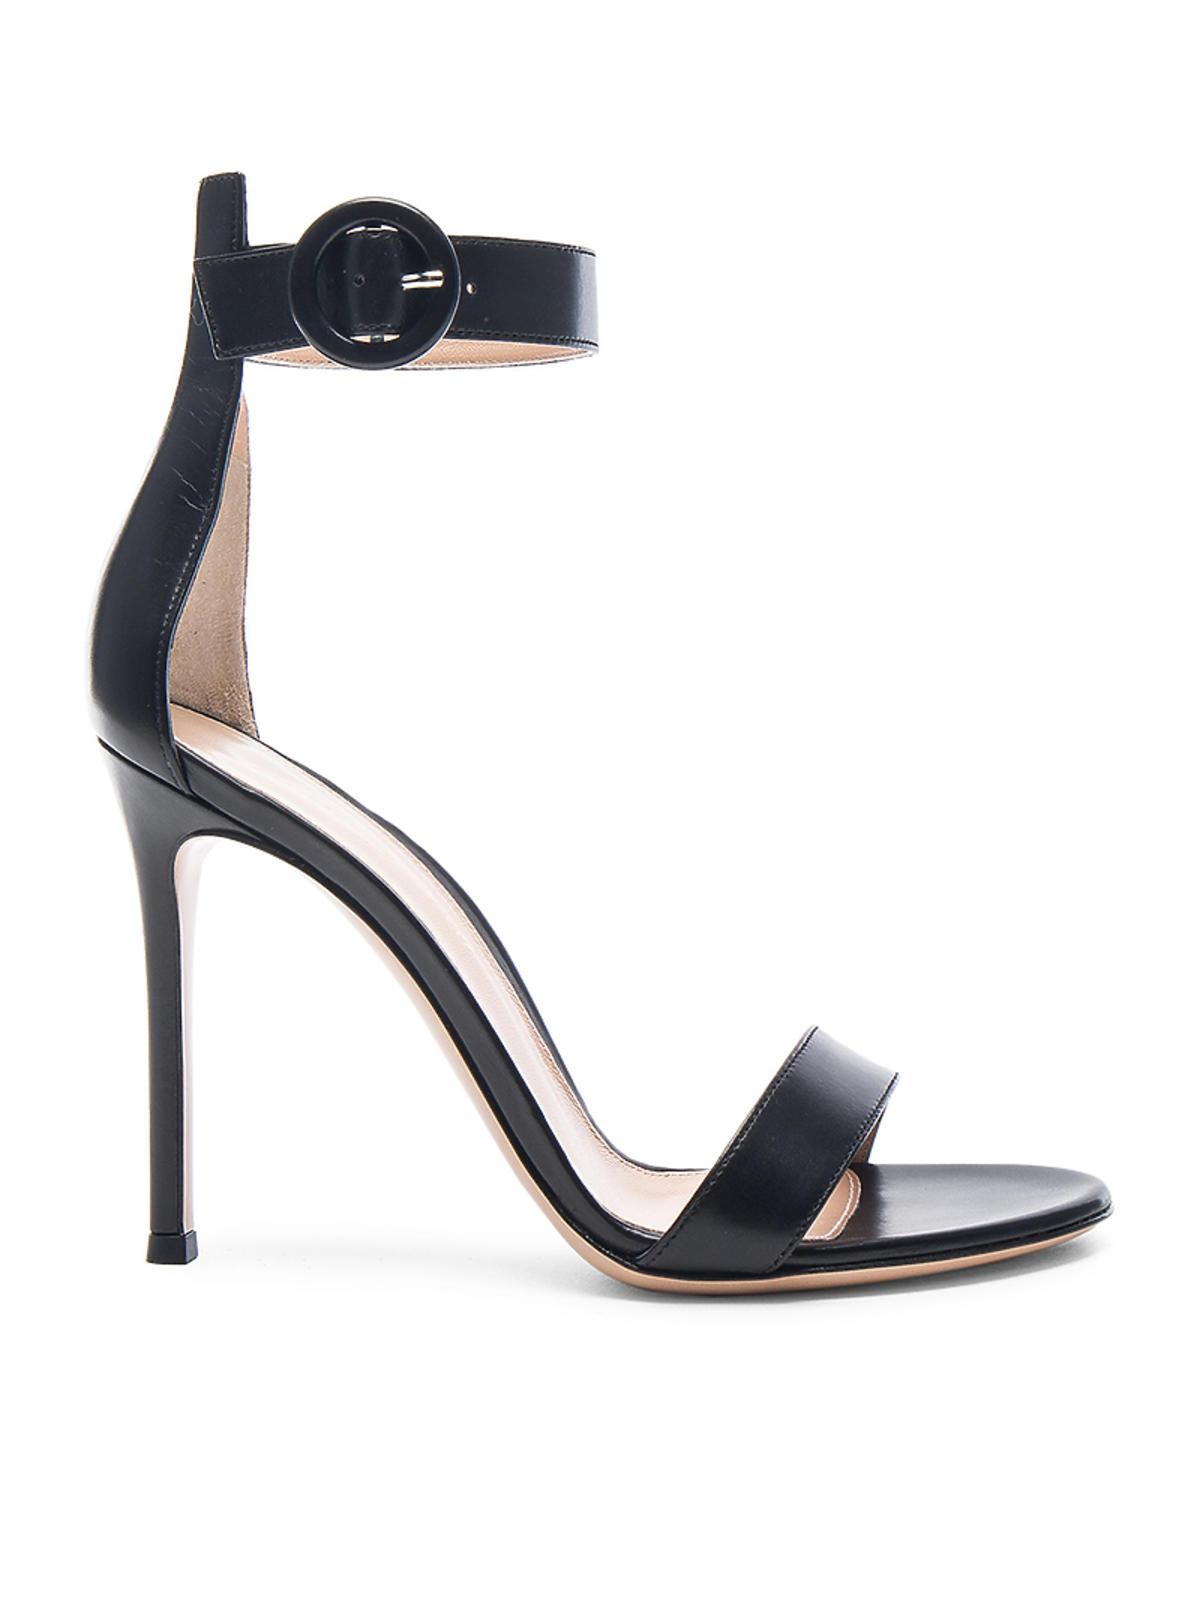 Sandałki marki Gianvito Rossi, ok. 3100 zł